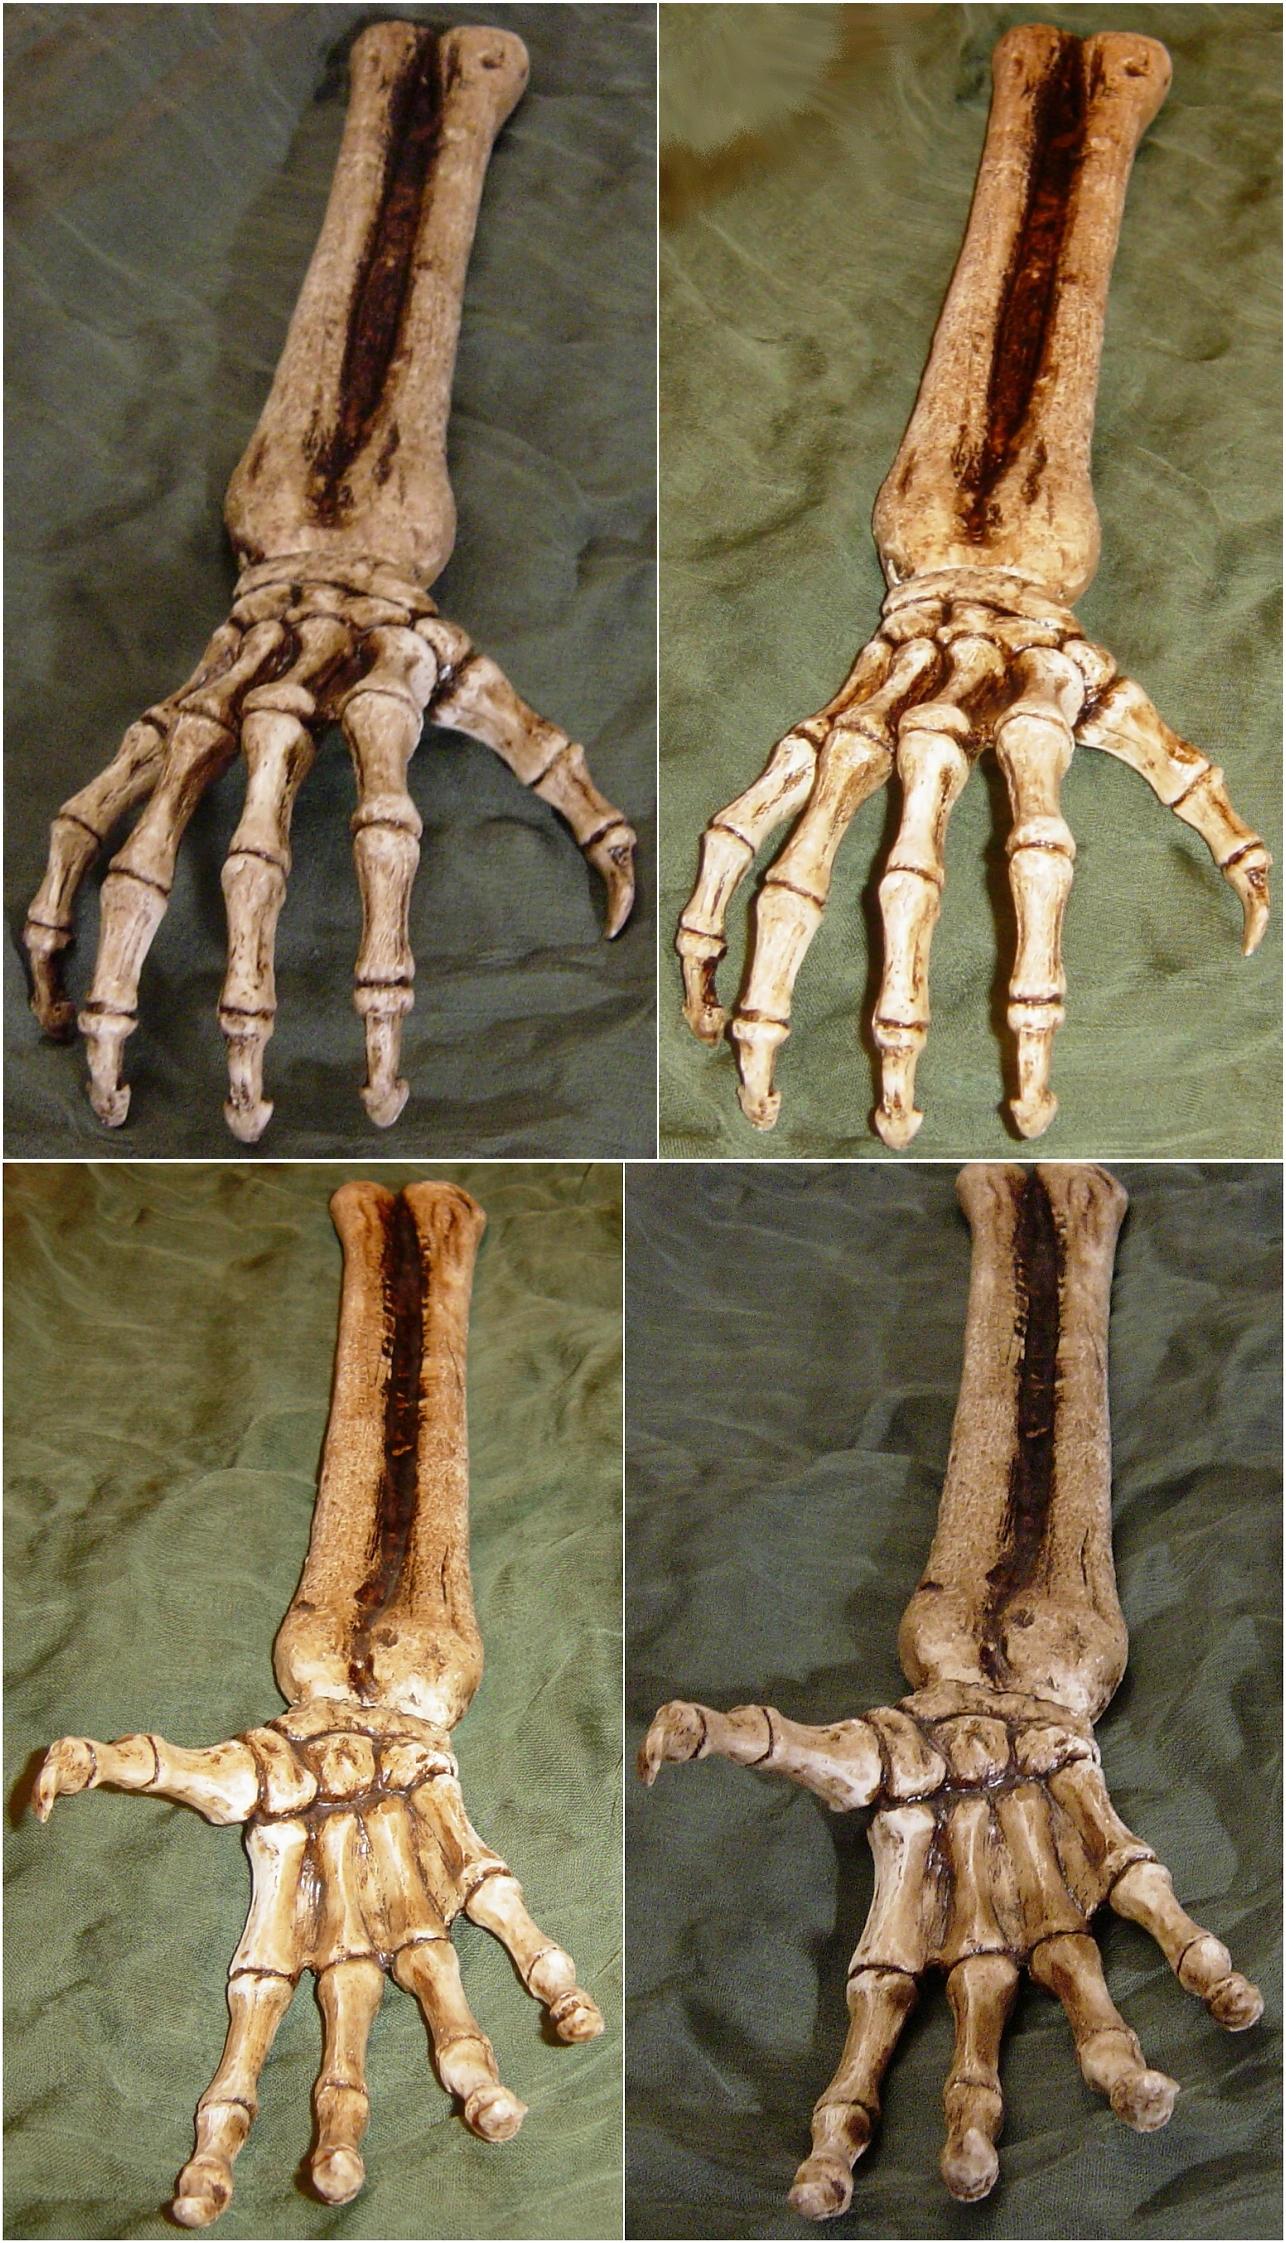 Skeletal Hand Bones Arm By Fantasystock On Deviantart